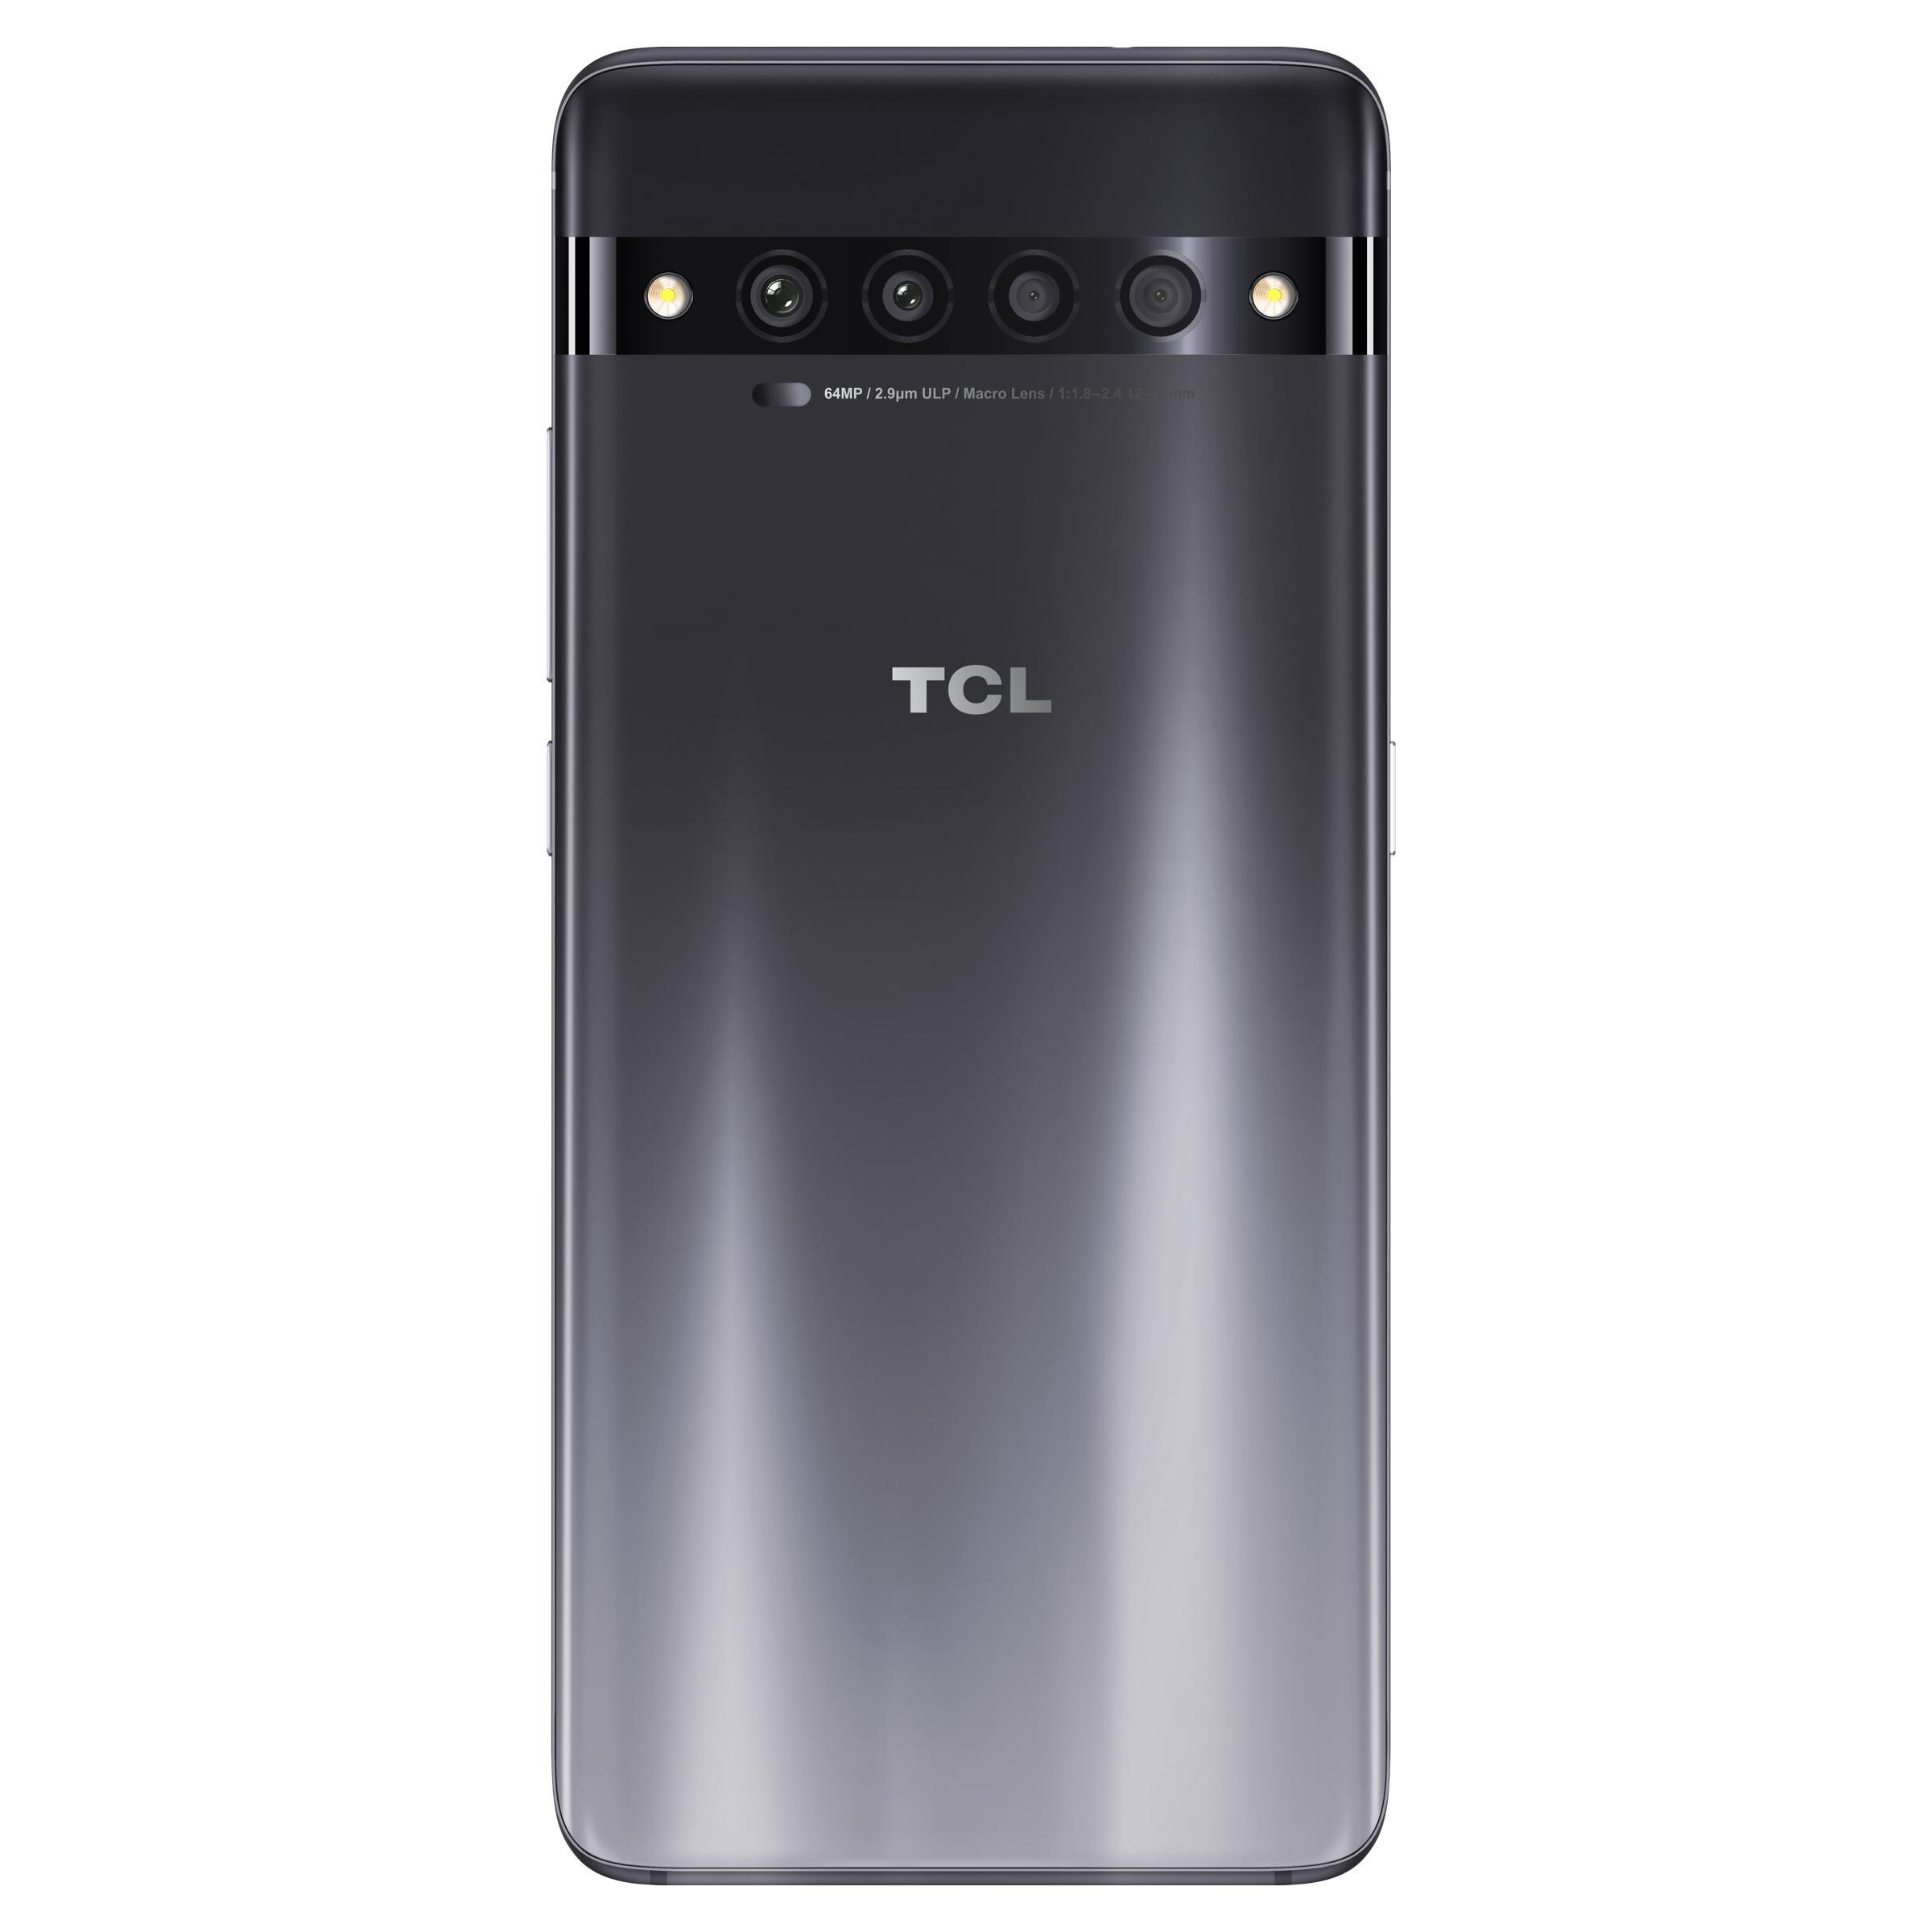 tcl 10 pro review